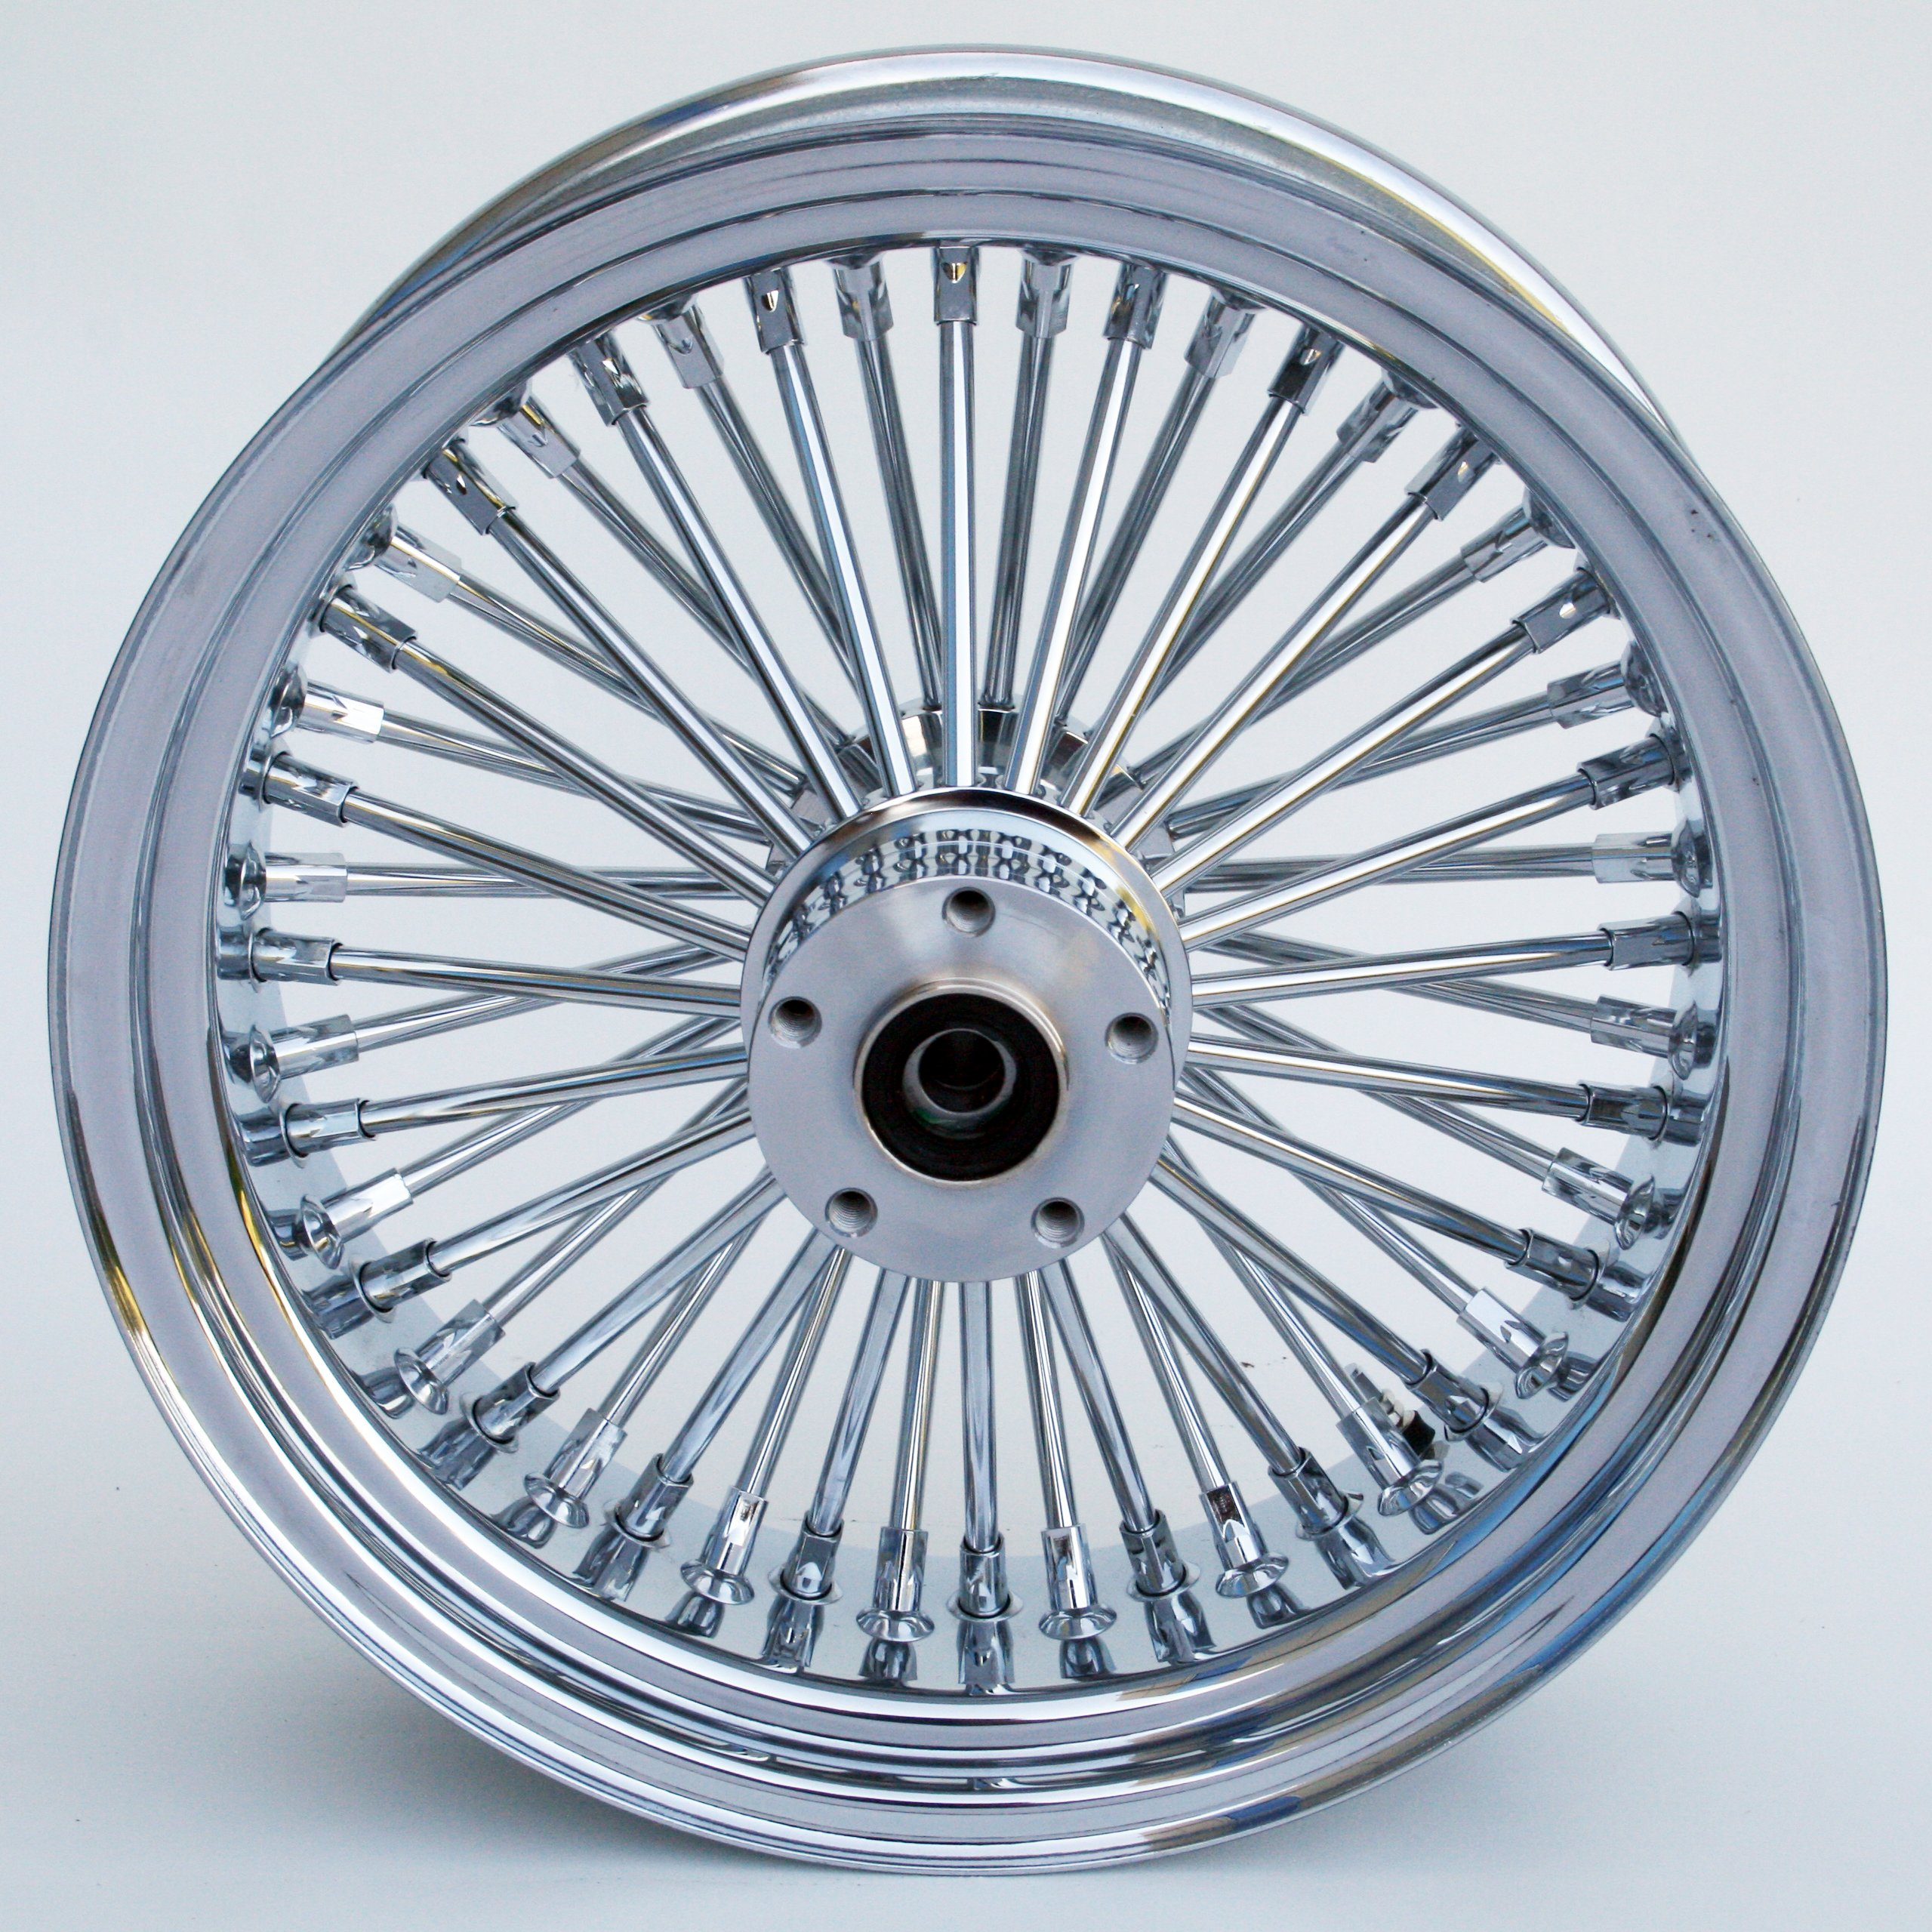 Chrome Ultima King Spoke 18'' x 3.5'' Rear Wheel for Harley Davidson and Custom Models